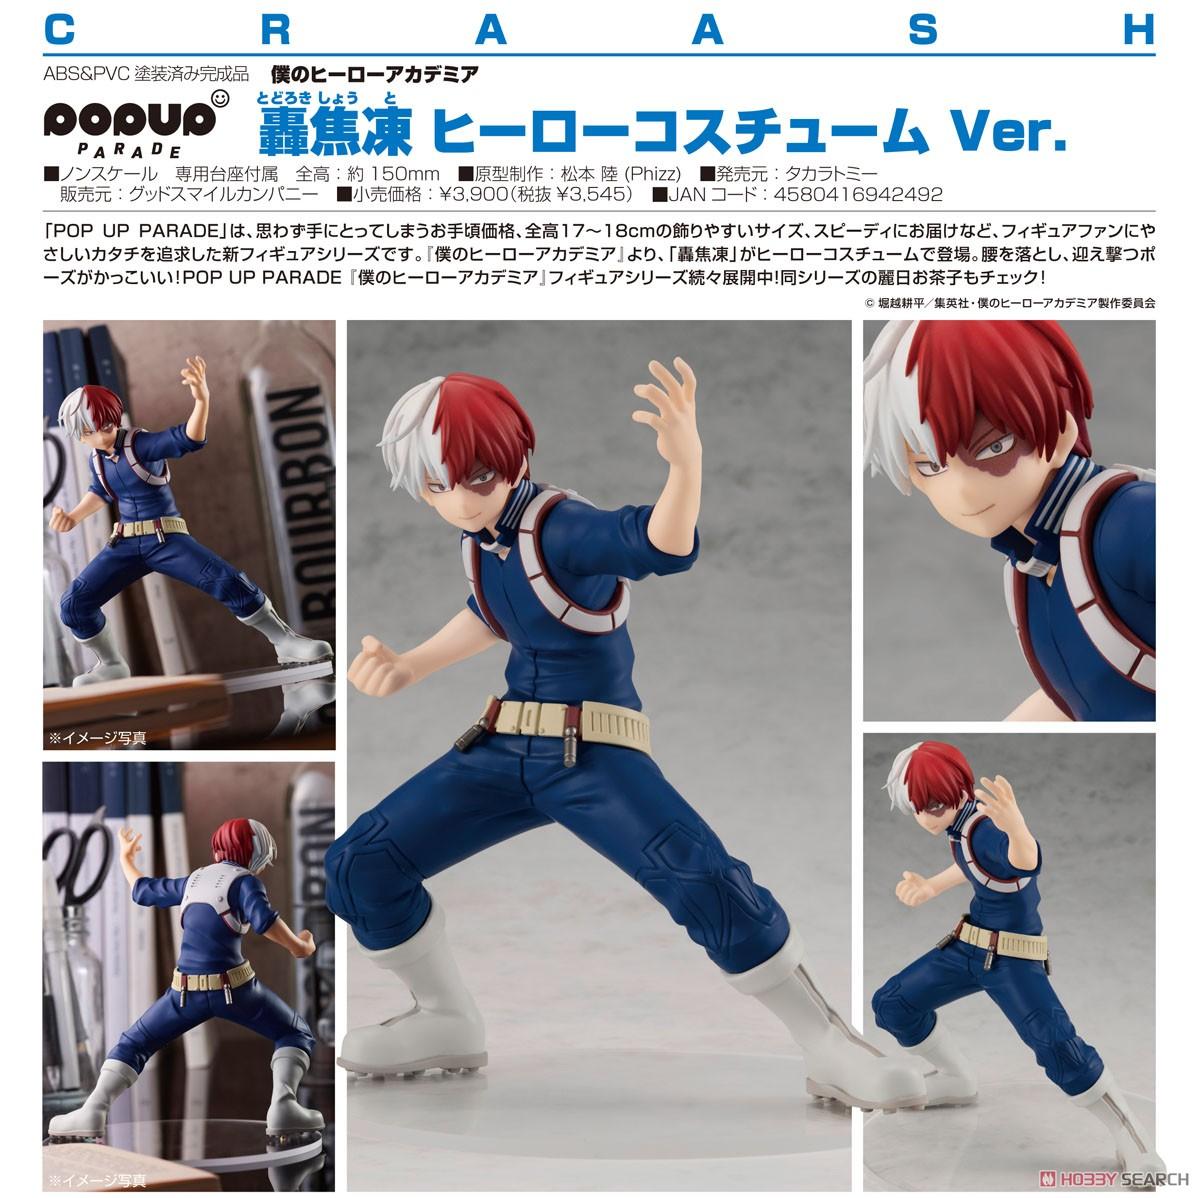 POP UP PARADE『轟焦凍 ヒーローコスチューム Ver.』僕のヒーローアカデミア 完成品フィギュア-012